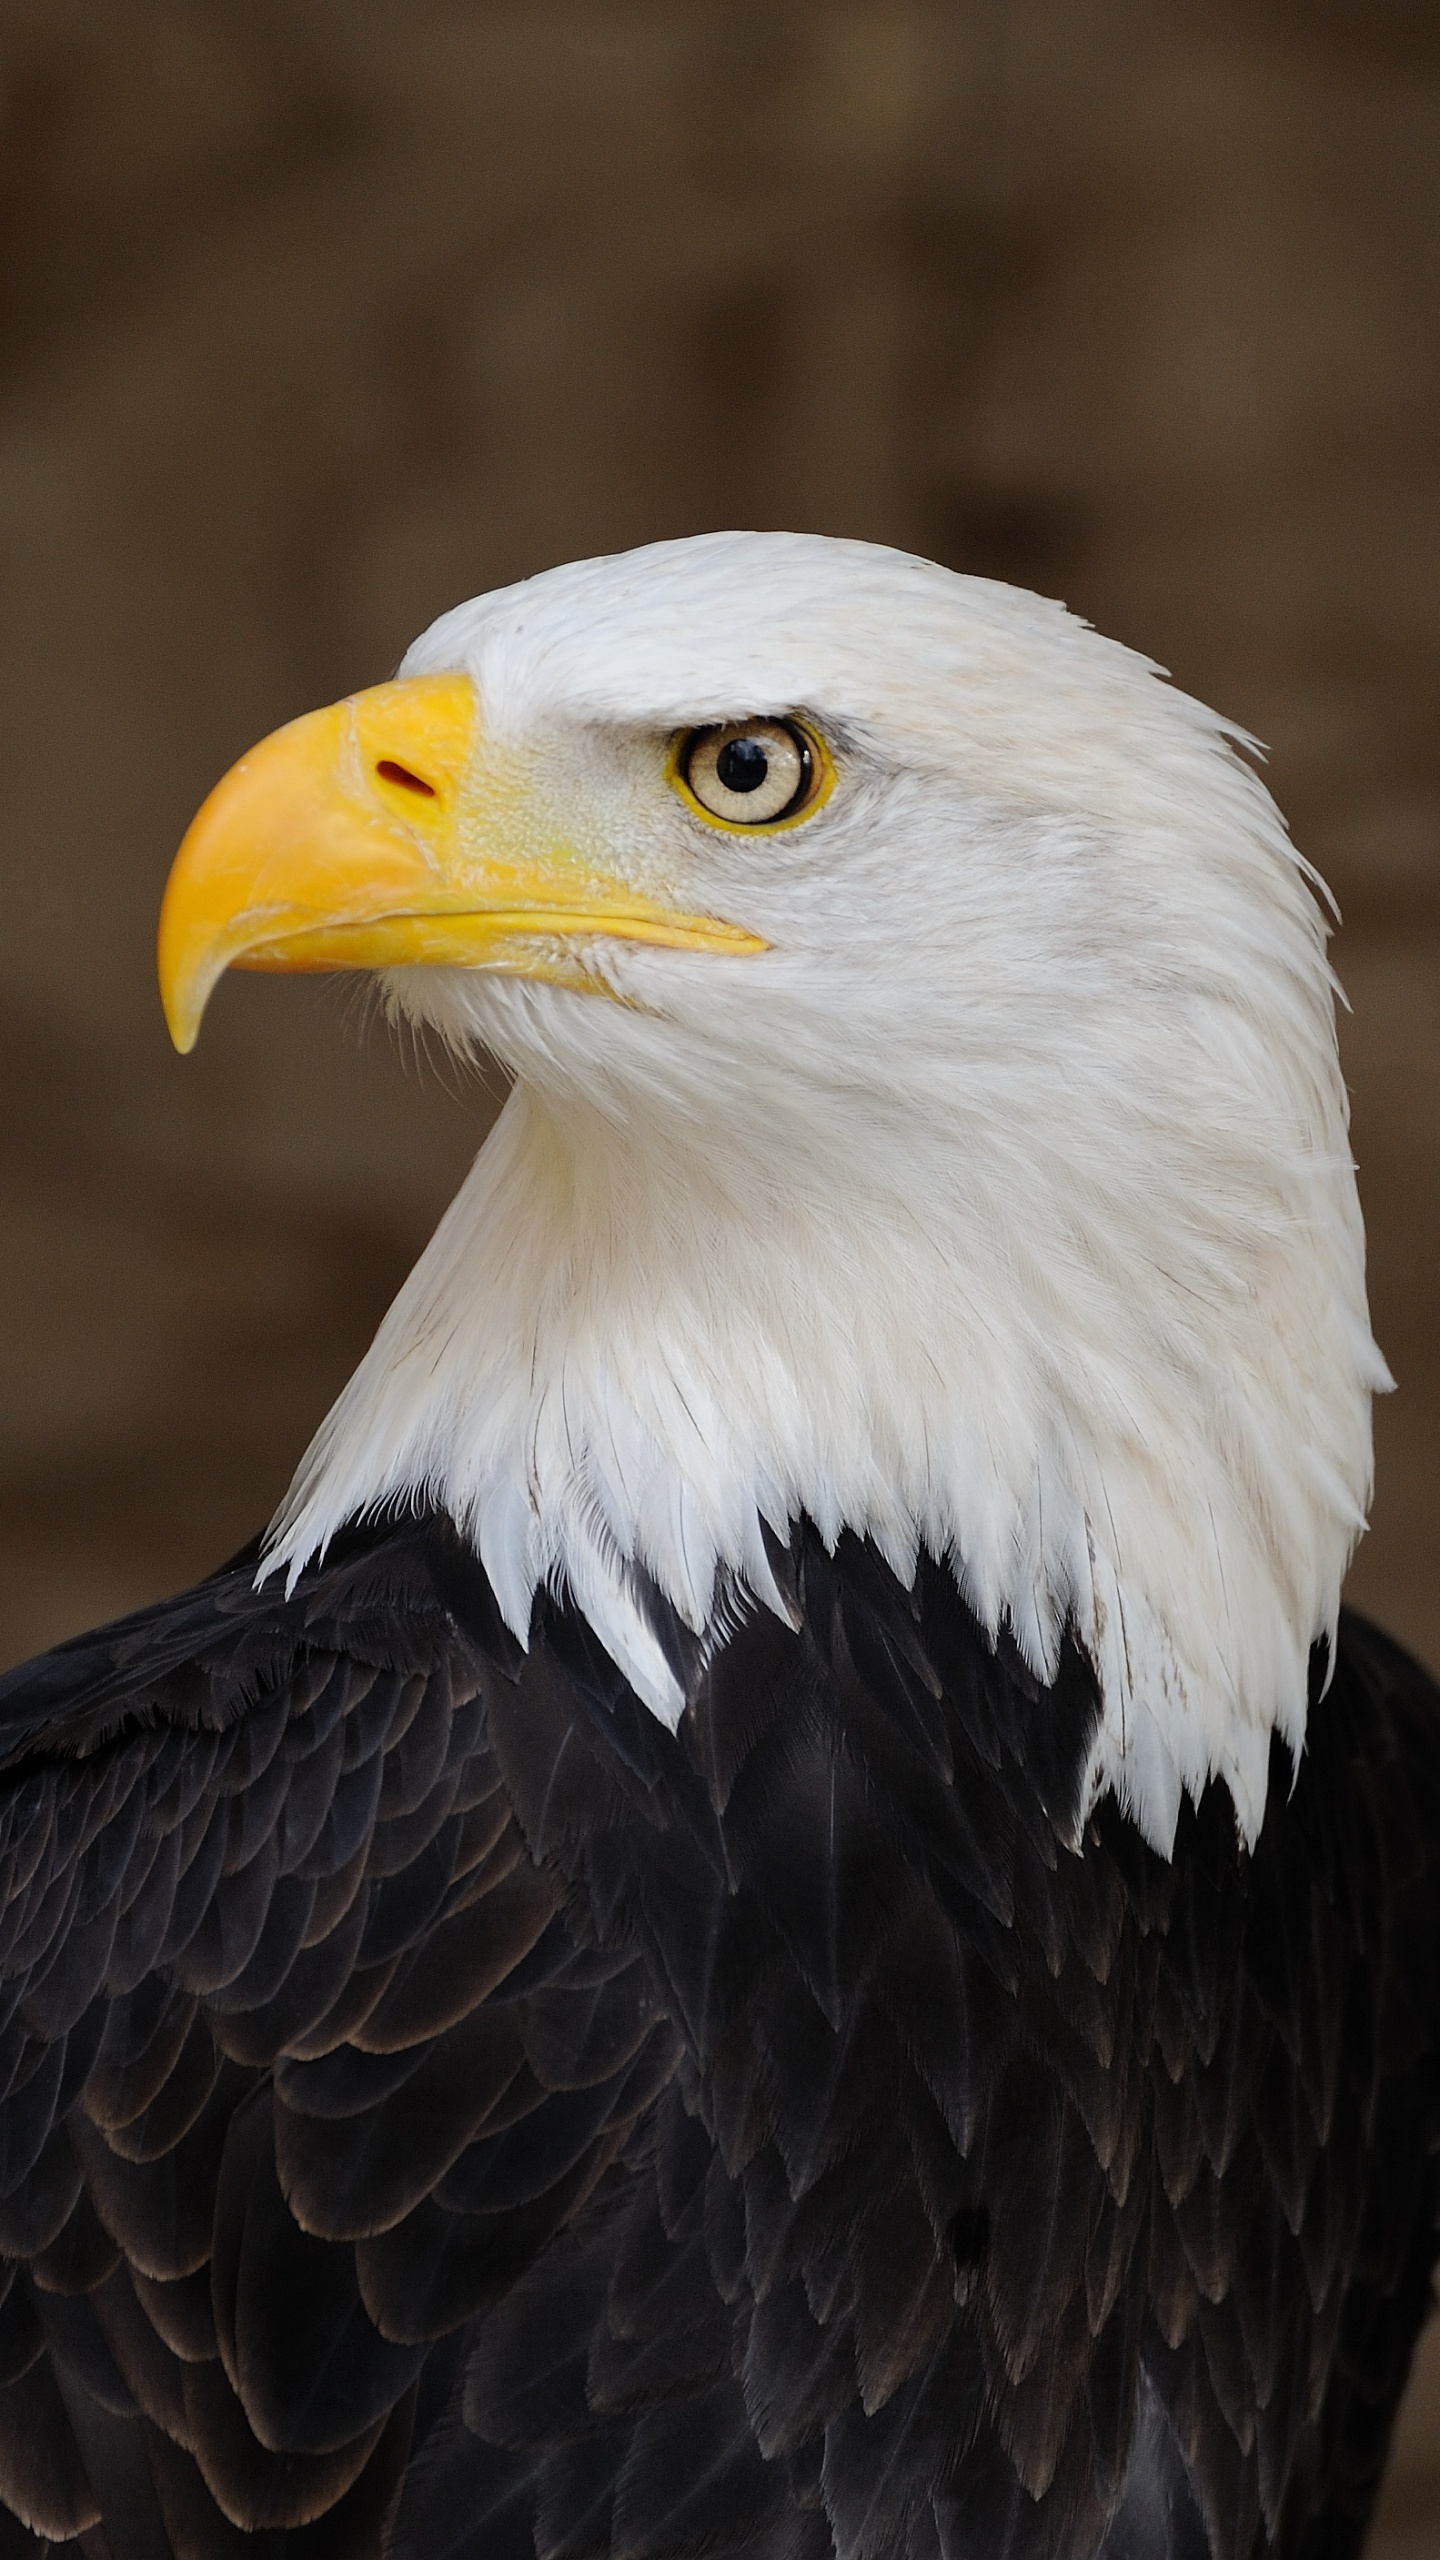 Bald_Eagle_Portrait_1533148477402.jpg